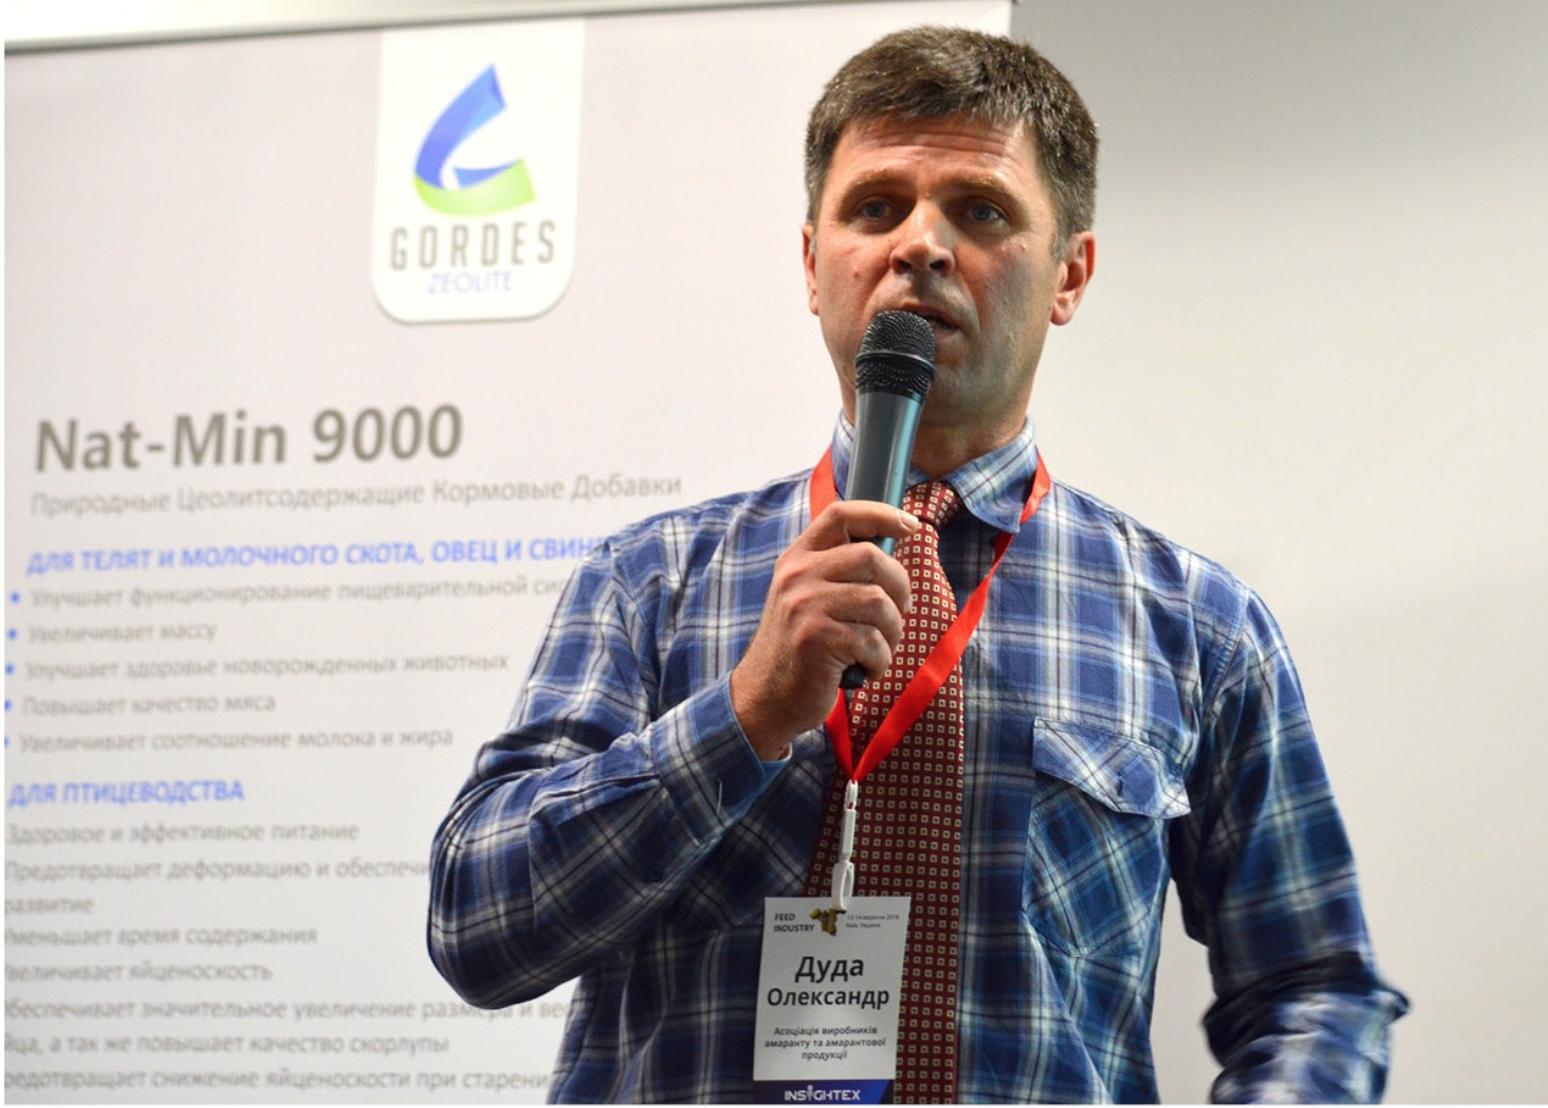 Александр Дуда, директор Ассоциации производителей амаранта и амарантовой продукции